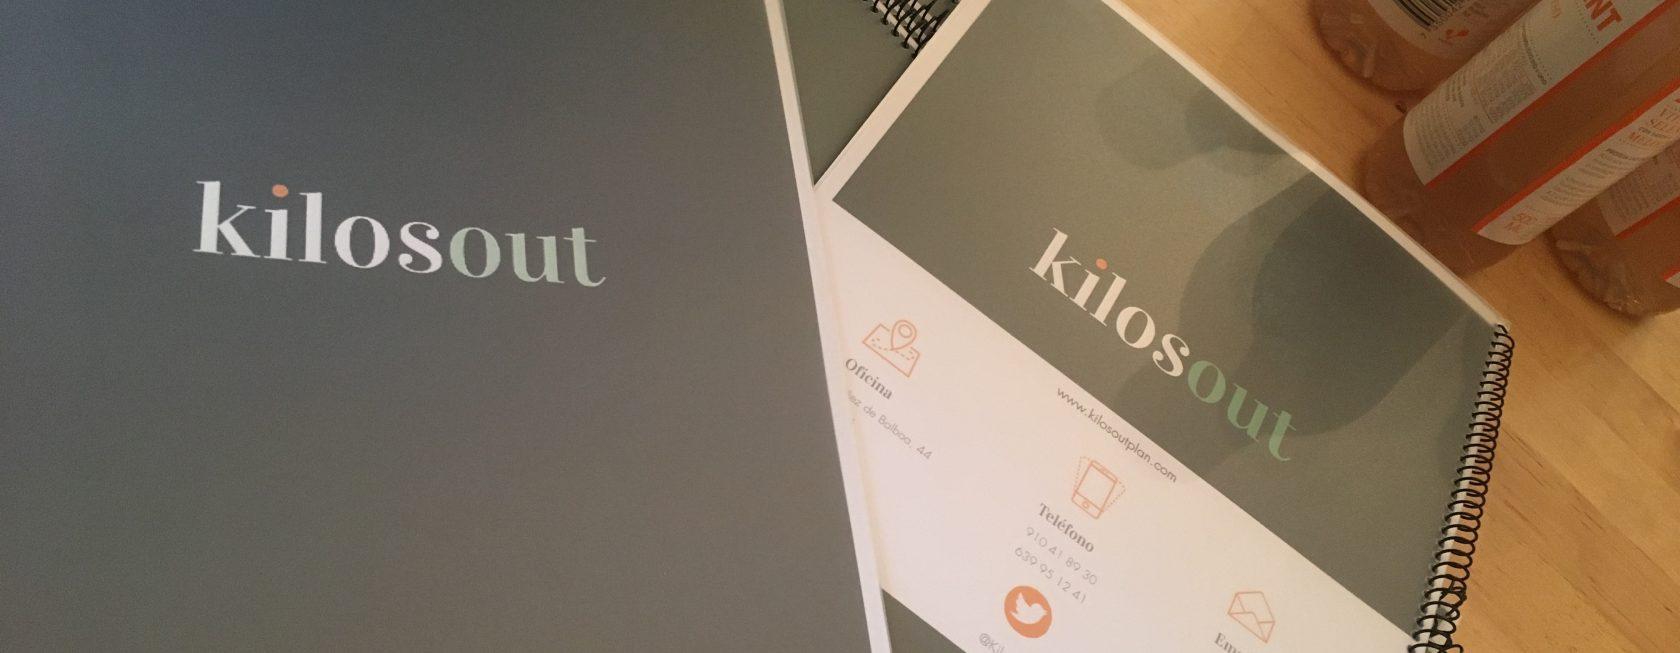 dossier de prensa de Kilosout